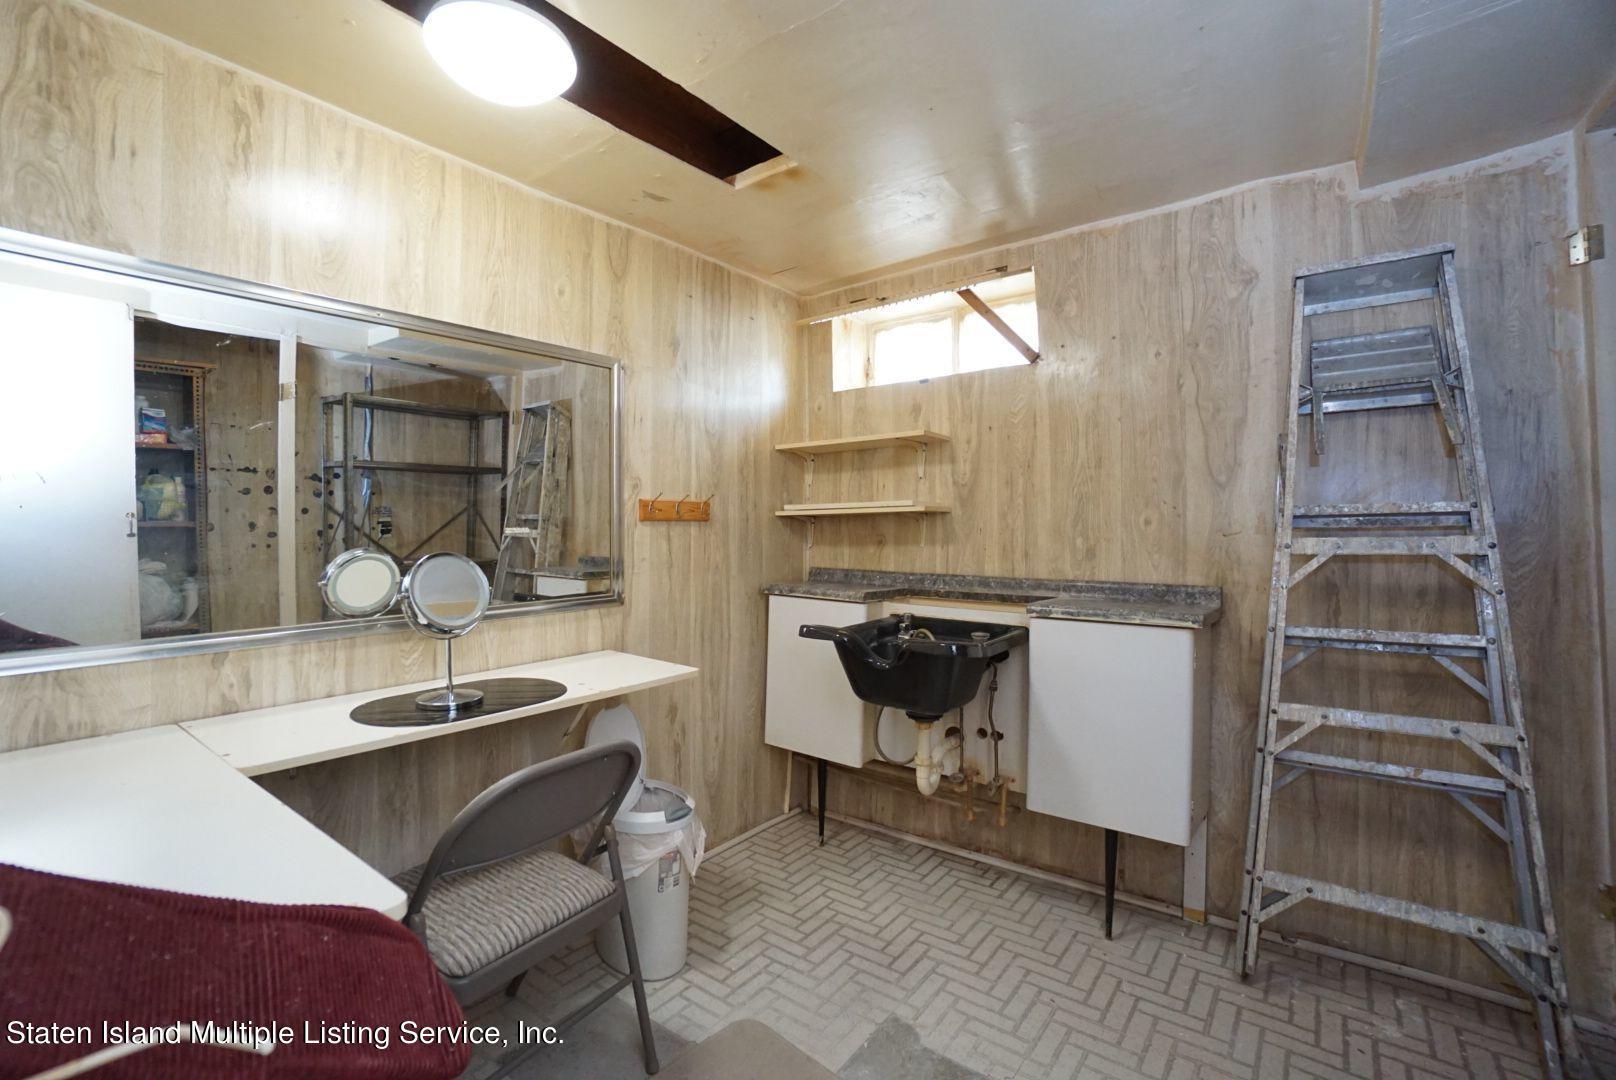 Single Family - Detached 94 Cranford Avenue  Staten Island, NY 10306, MLS-1146620-41